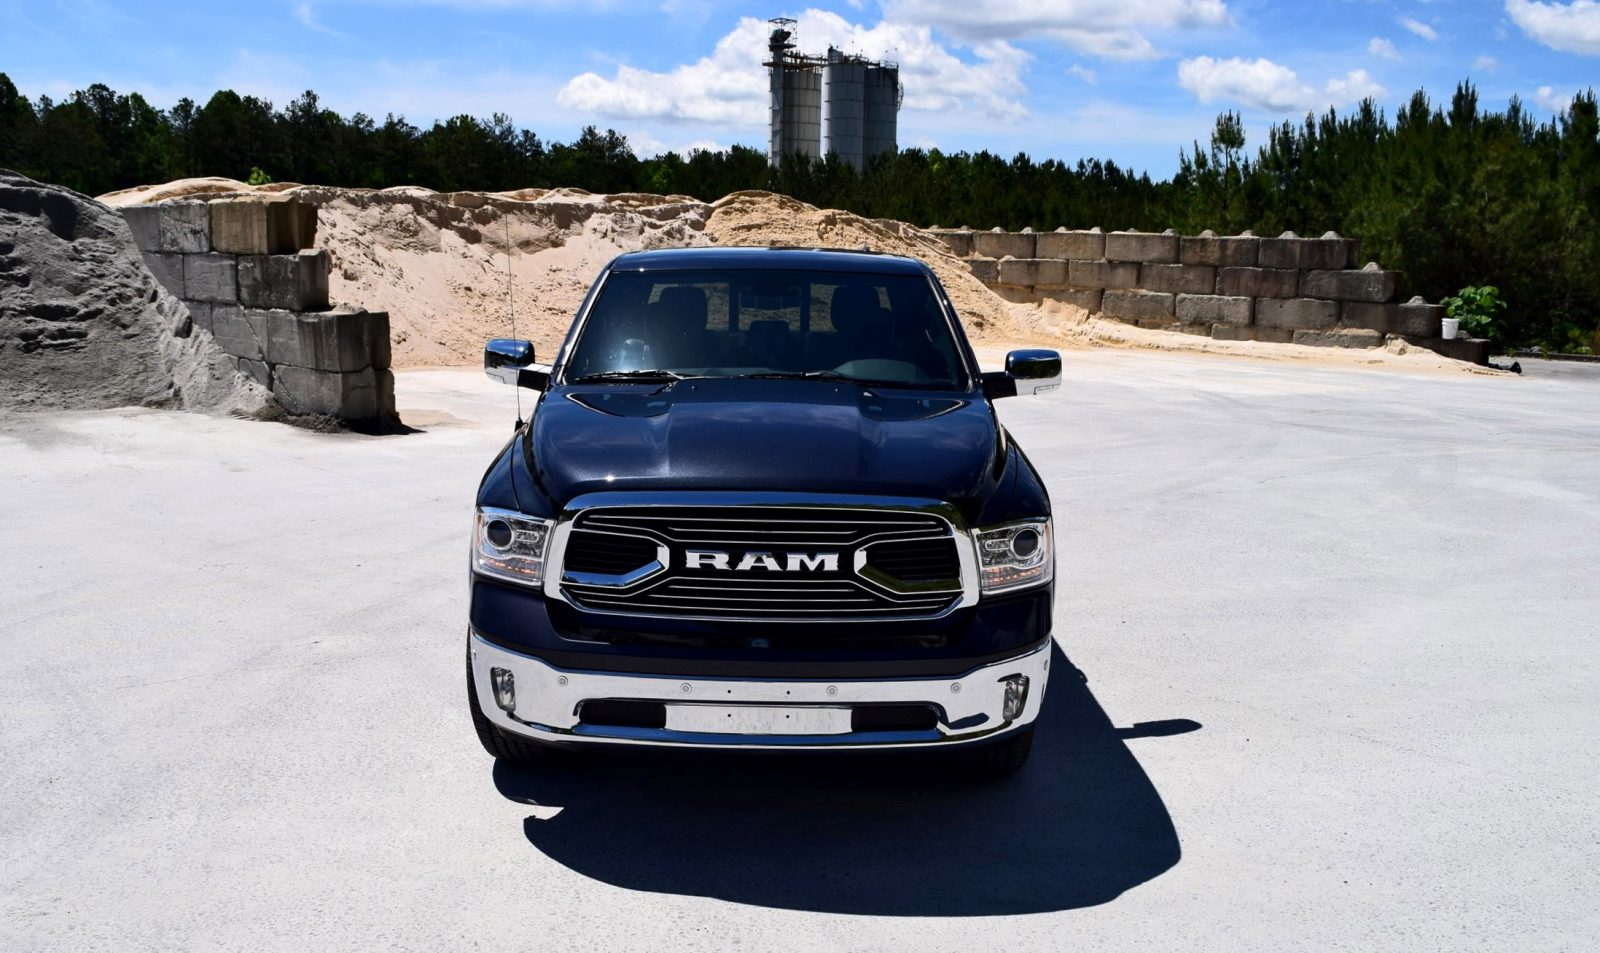 2016 RAM 1500 LIMITED EcoDiesel BLACK 4